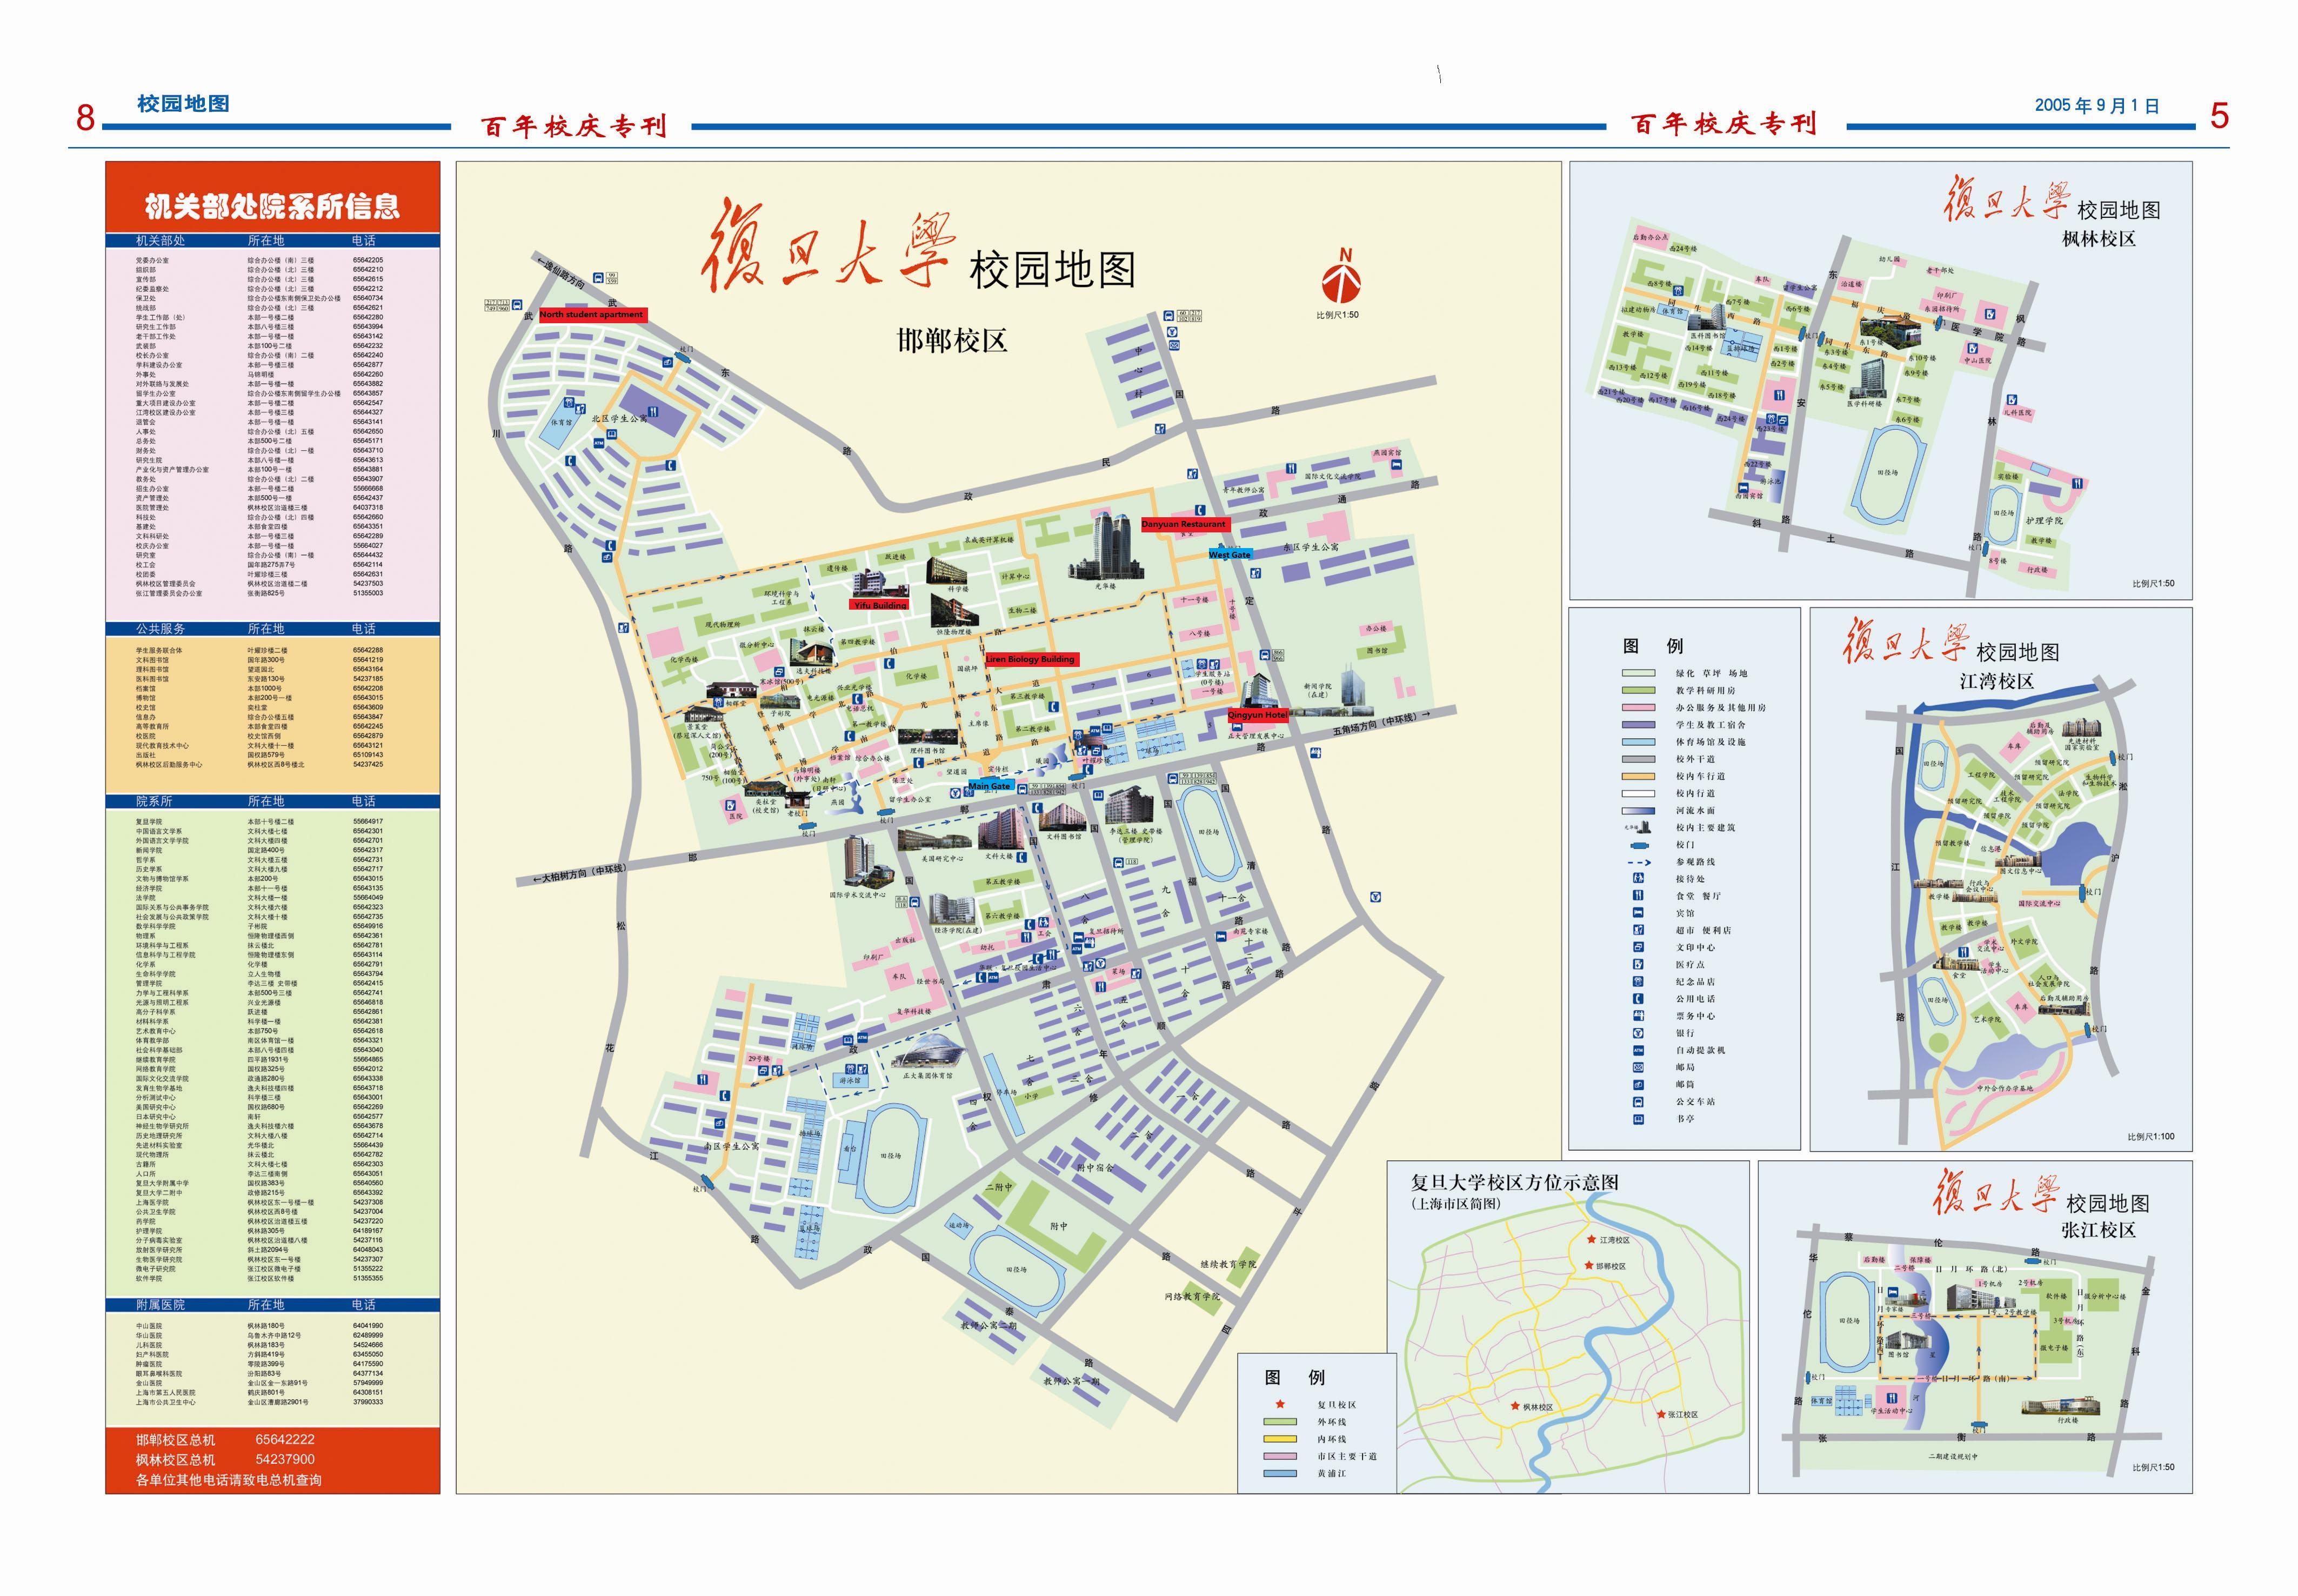 université fudan chine